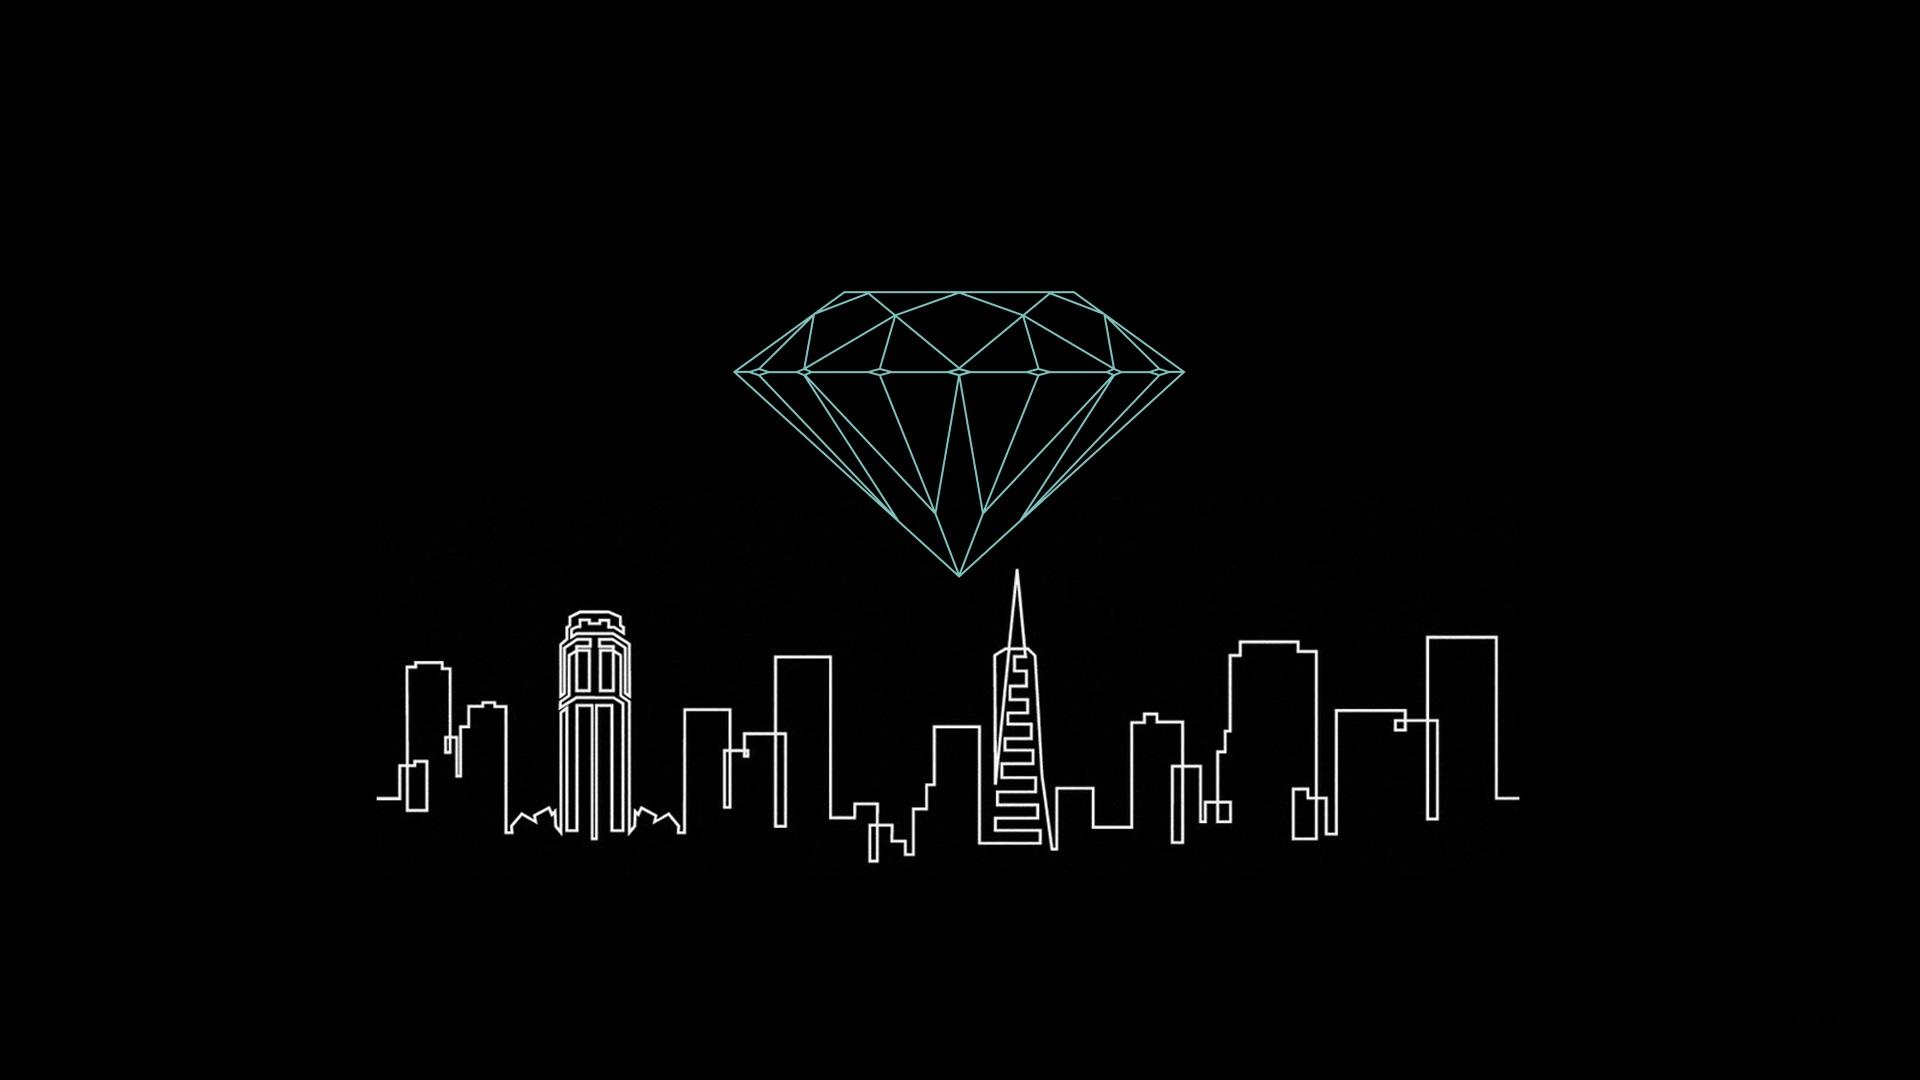 diamond wallpaper tumblr |Diamond Supply Co Tumblr Layouts